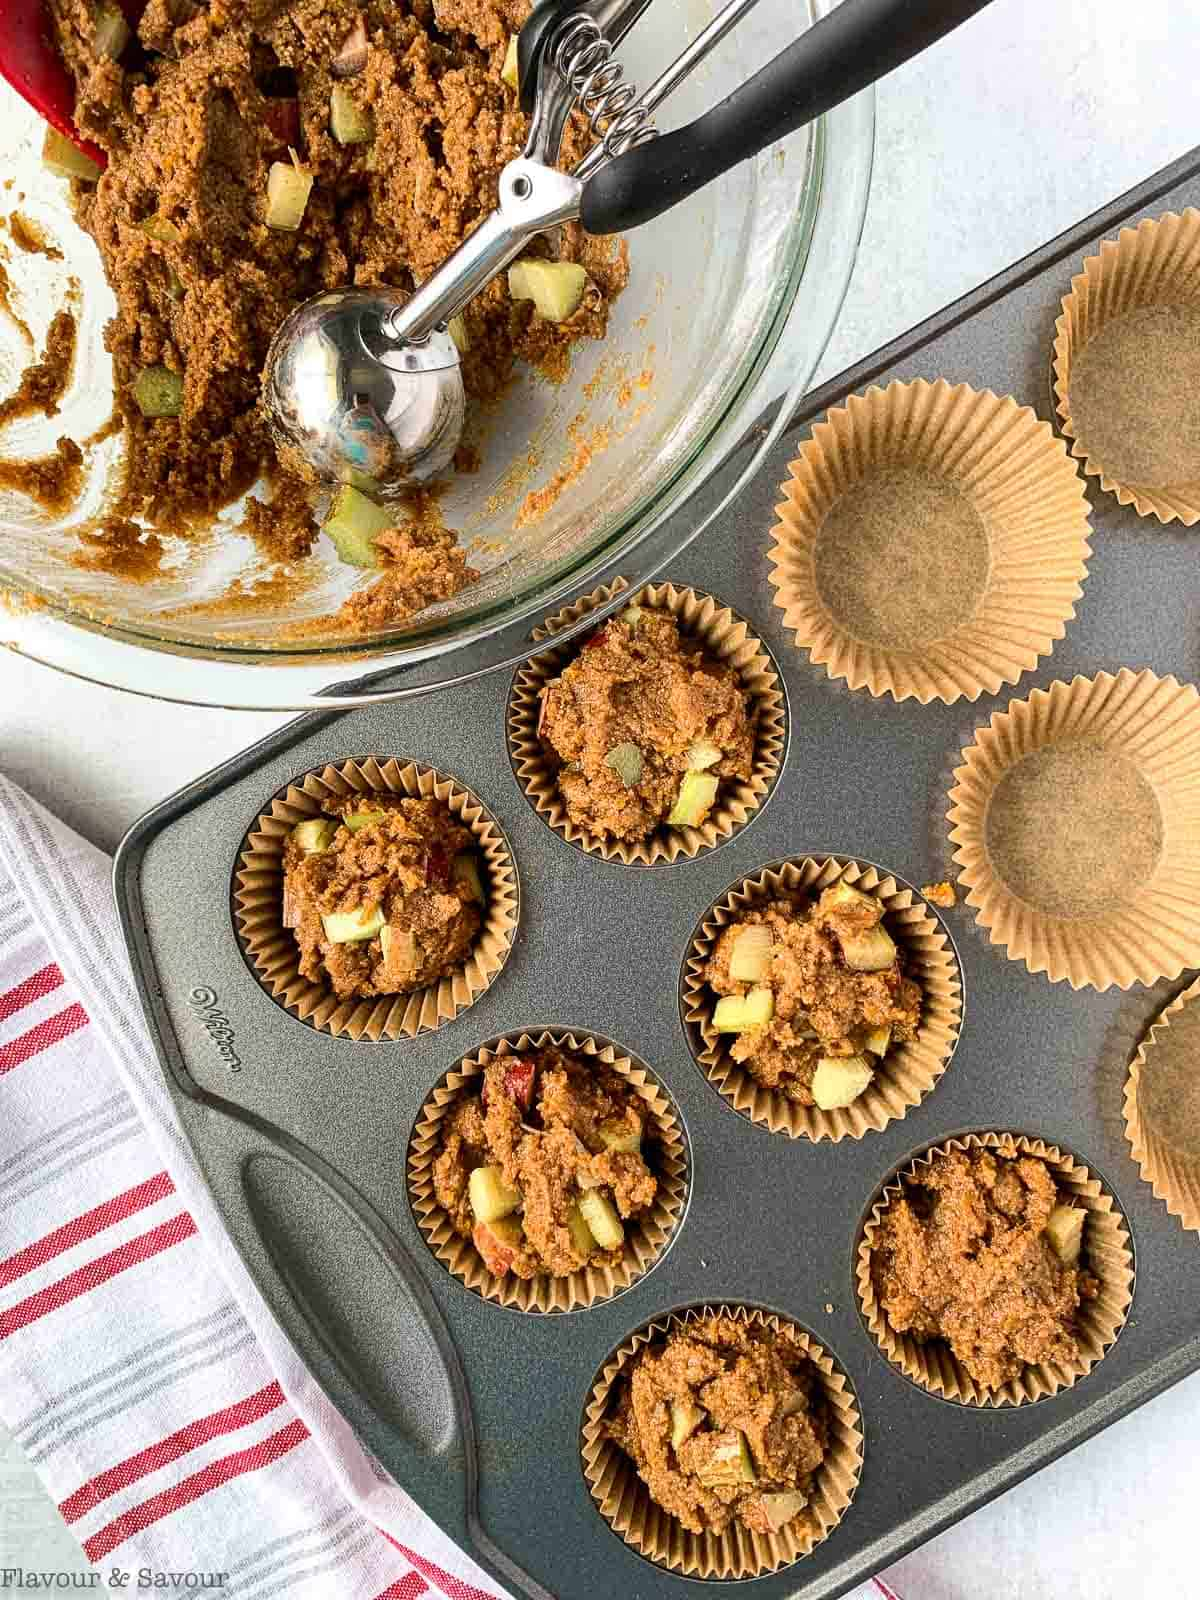 rhubarb streusel muffin batter in a muffin tin